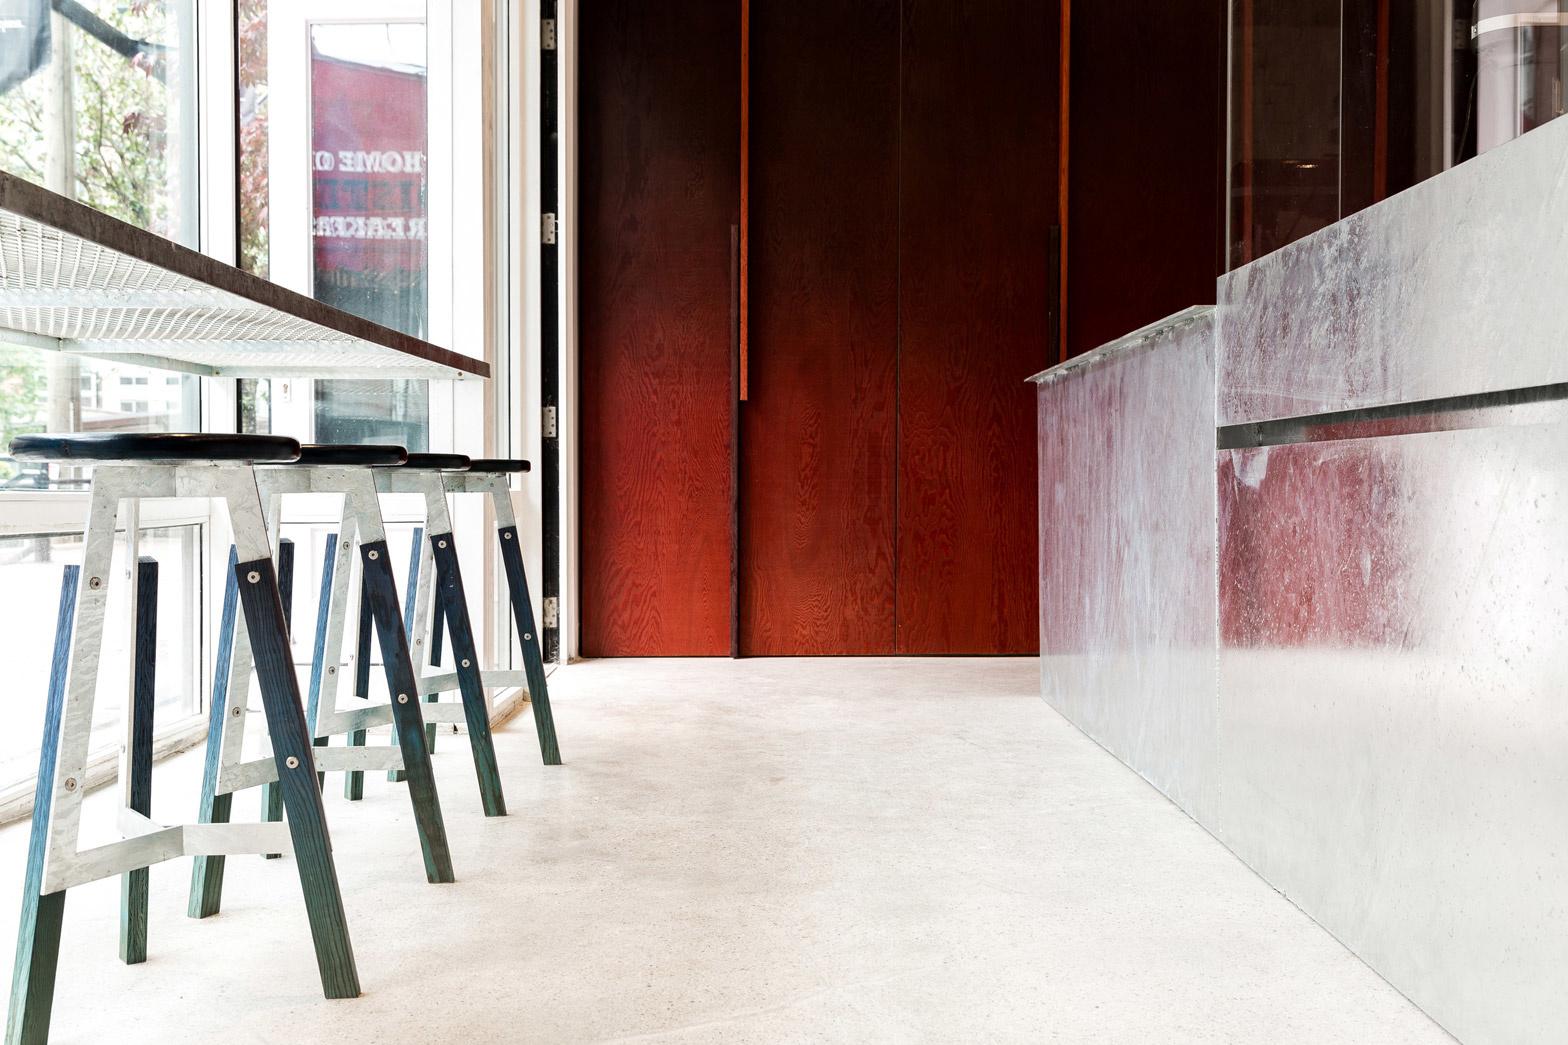 Mister Vancouver, Fahim Kassam / Scott and Scott architects